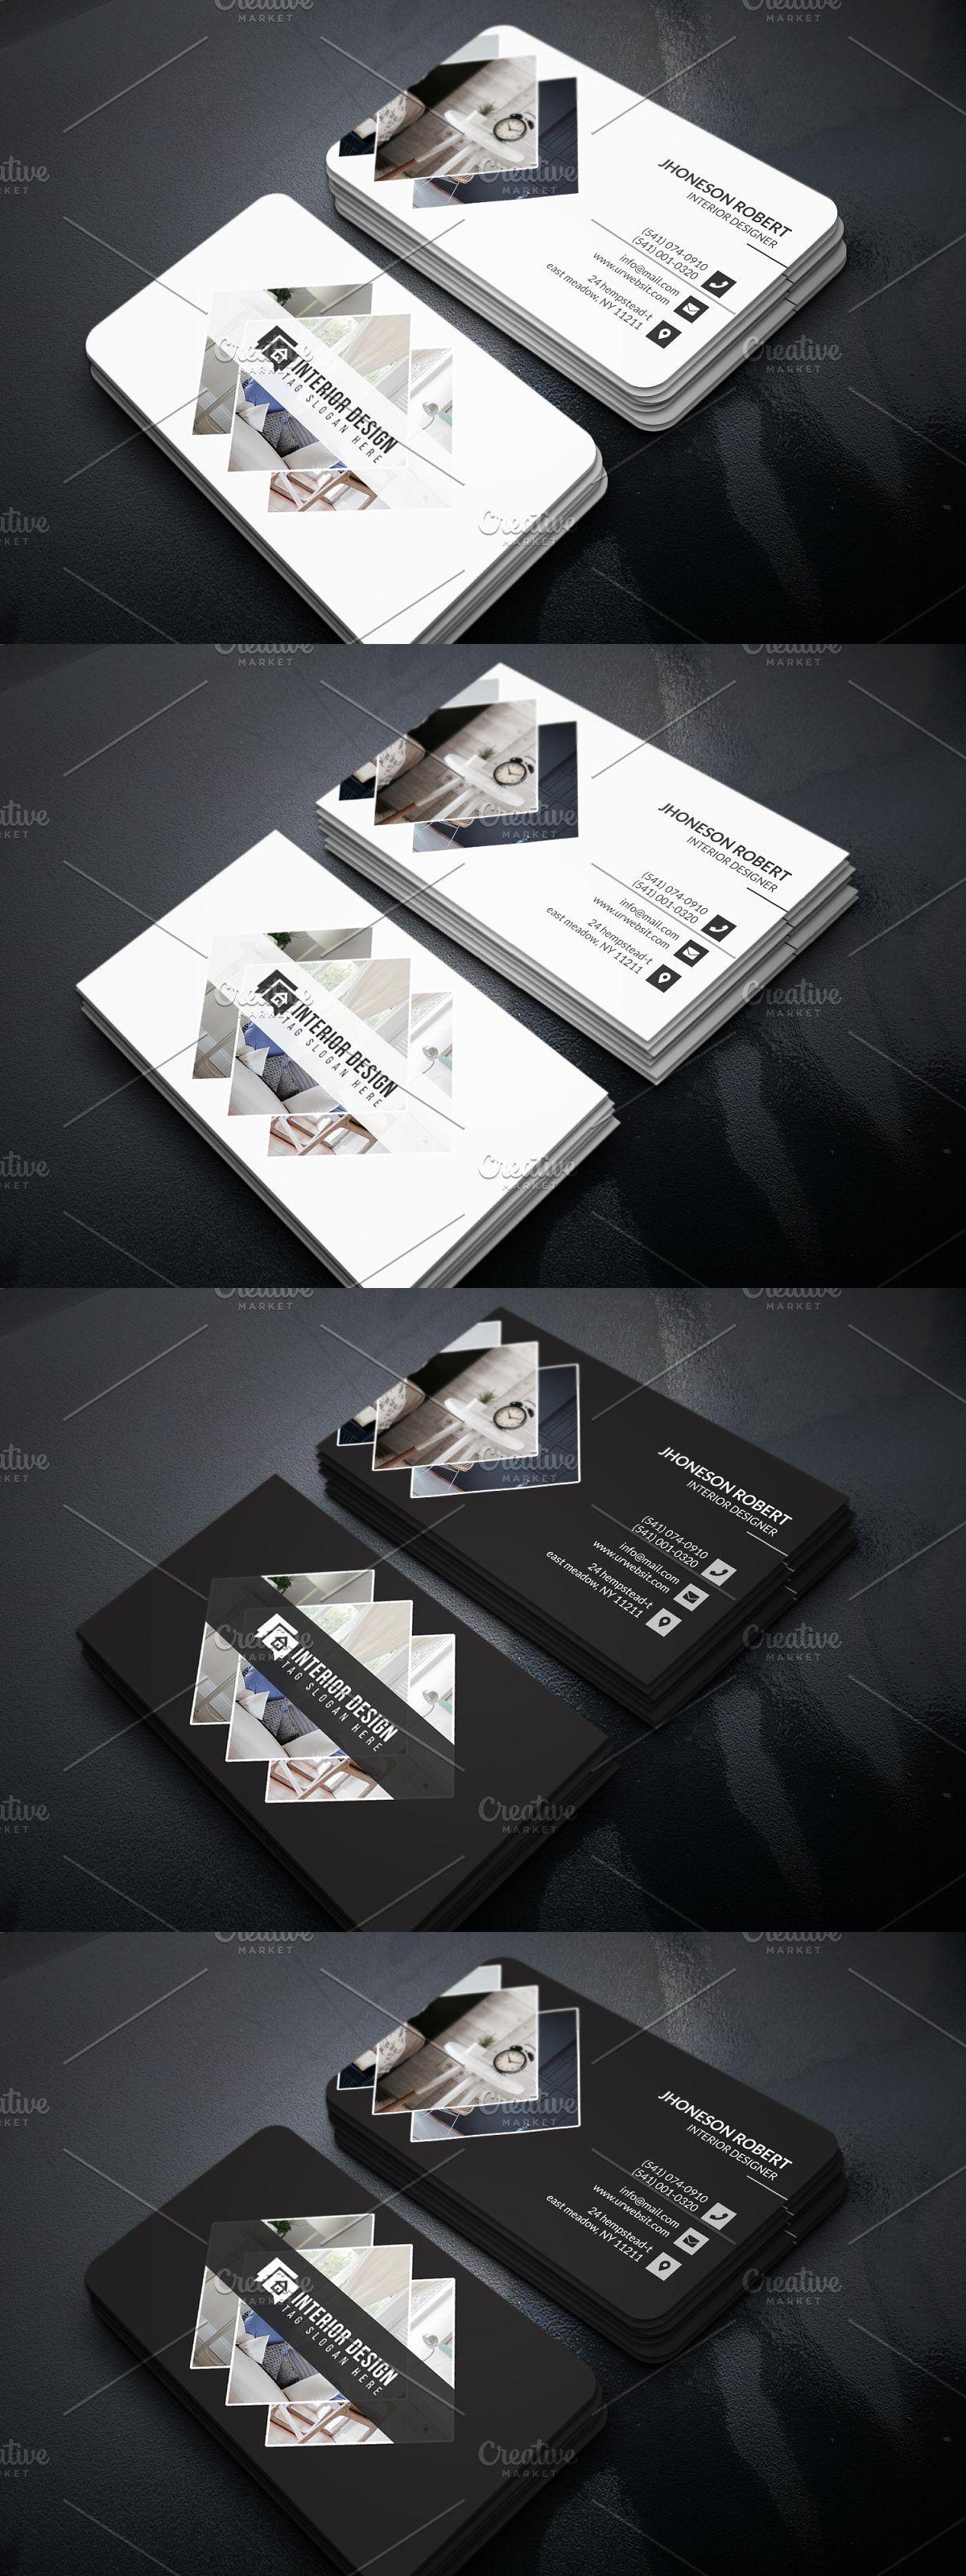 Interior Designer Business Card Interior Designer Business Card Business Card Design Minimalist Business Card Design